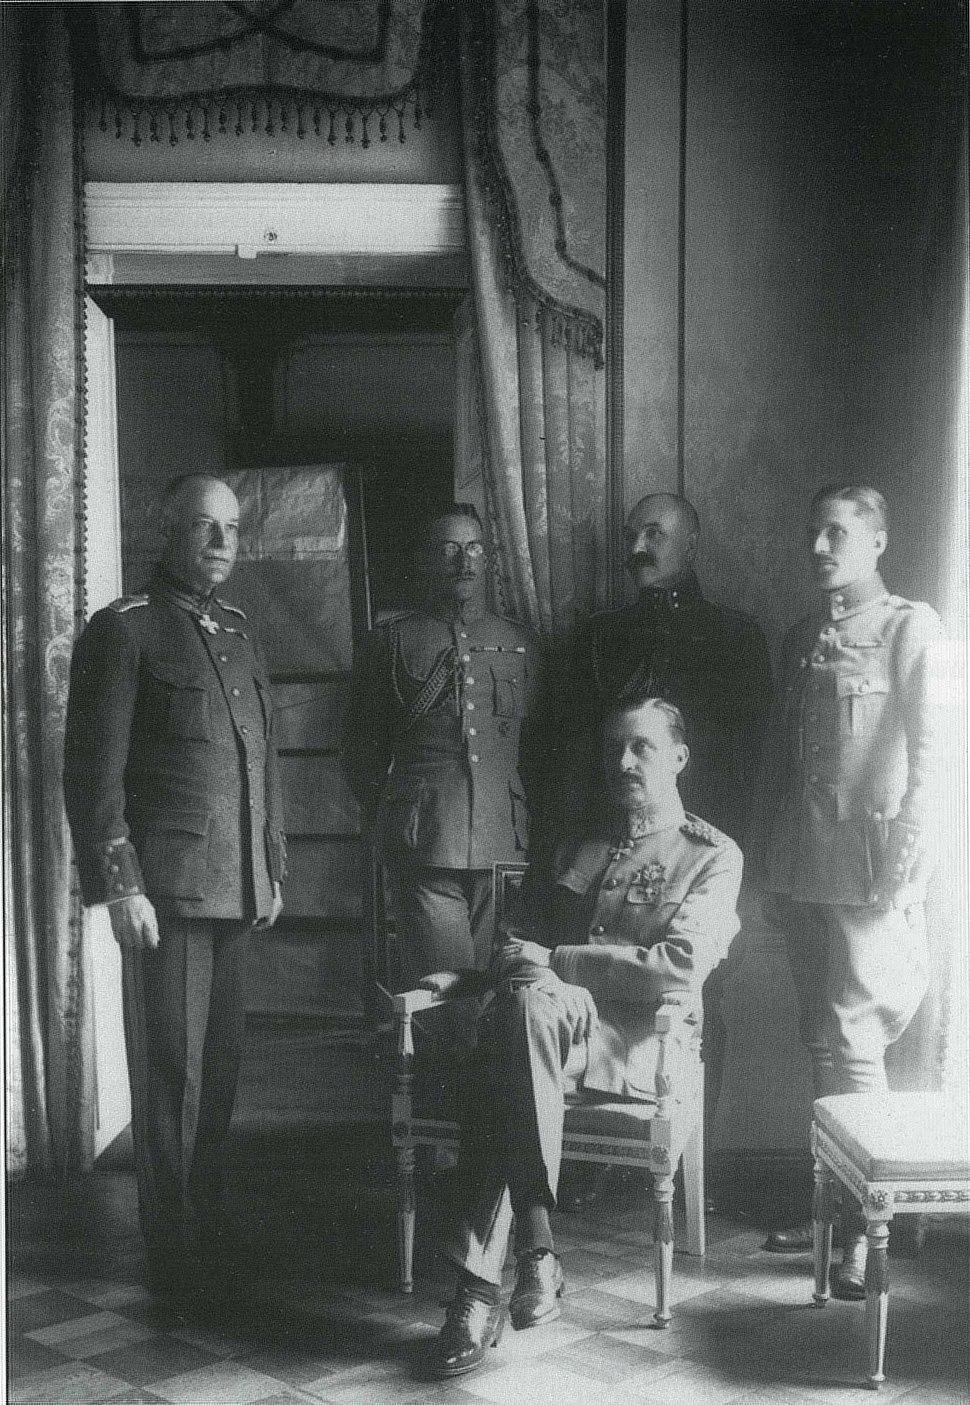 Mannerheim, Lilius, Kekoni, Gallen-Kallela, Rosenbr%C3%B6ijer